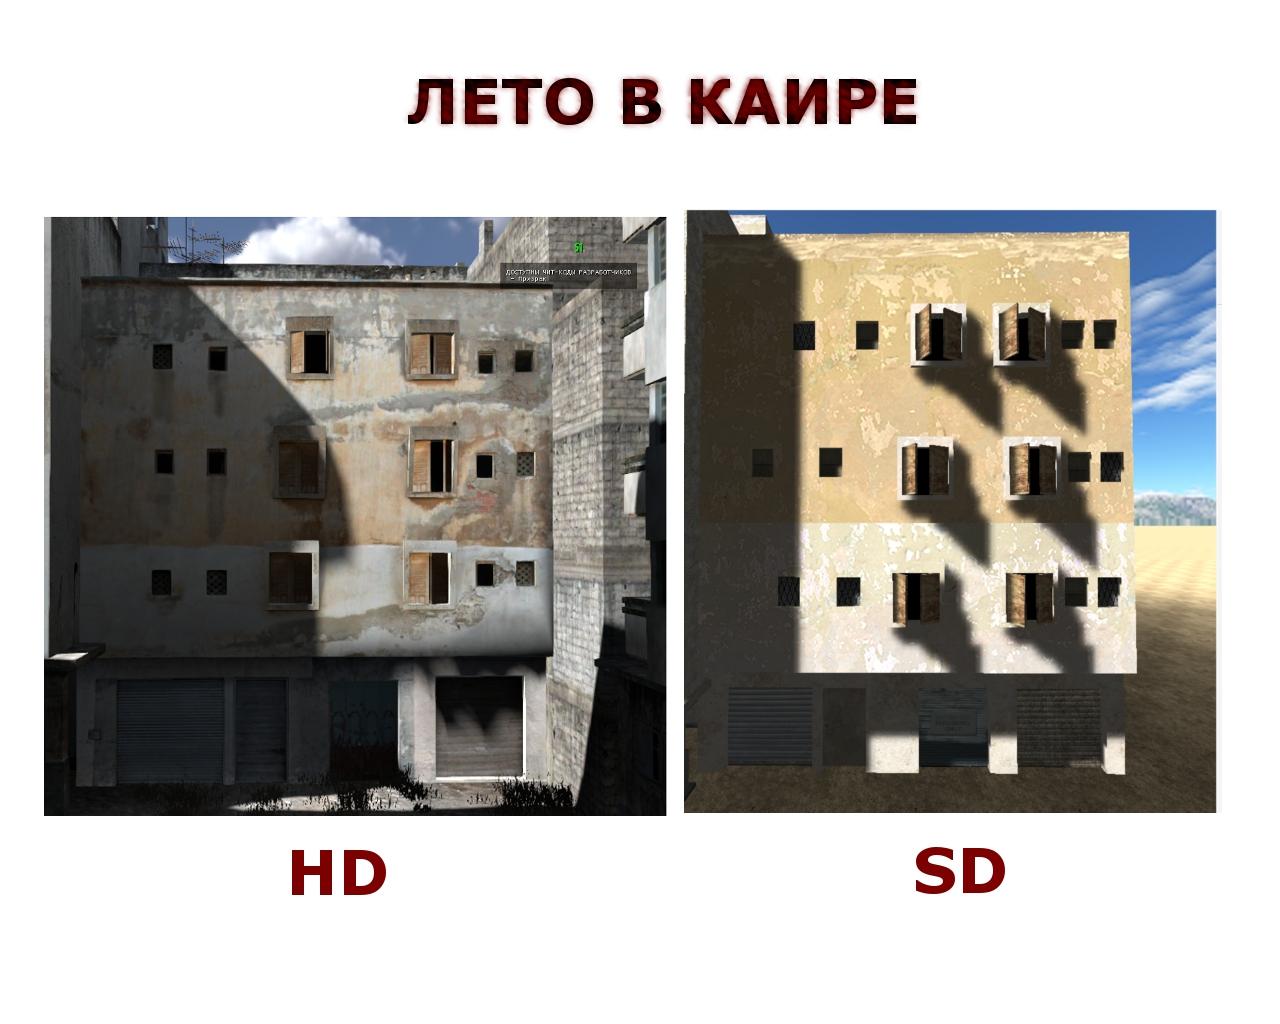 http://www.serioussite.ru/_ph/4/800285773.jpg?1404587208